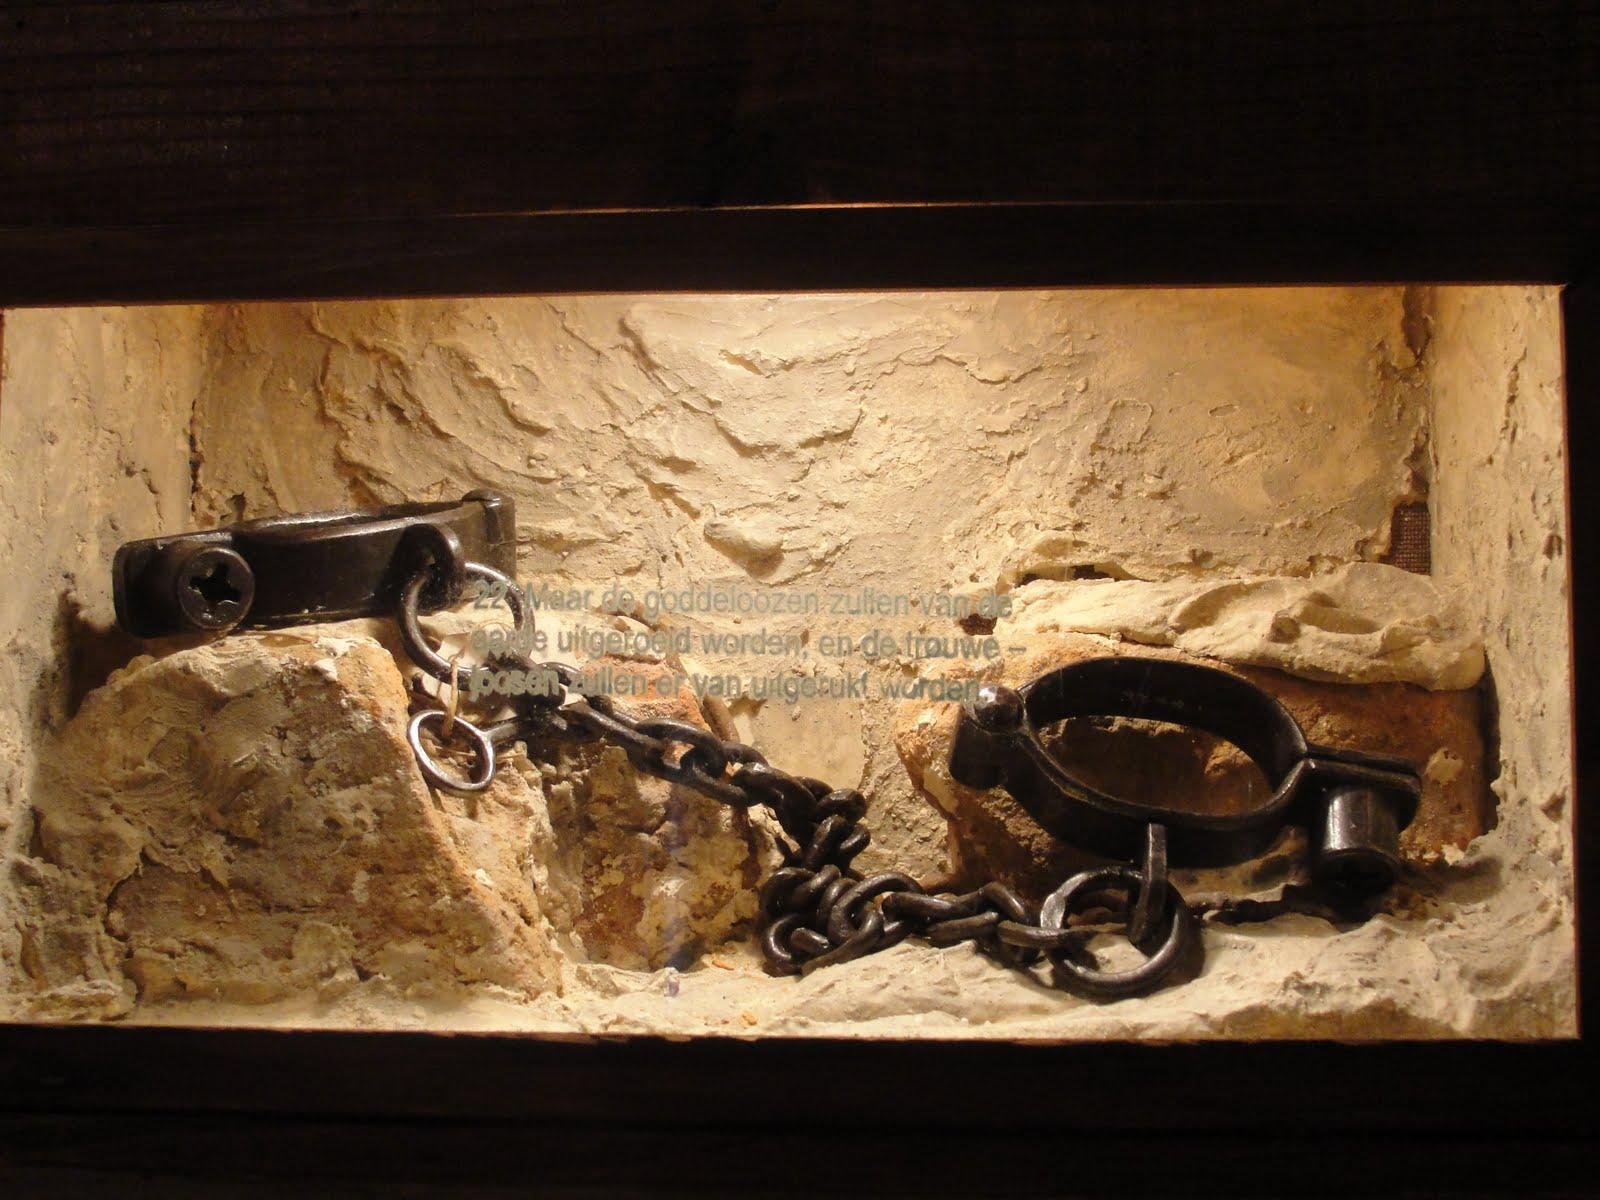 Randomly Nikky Slave Lodge Museum